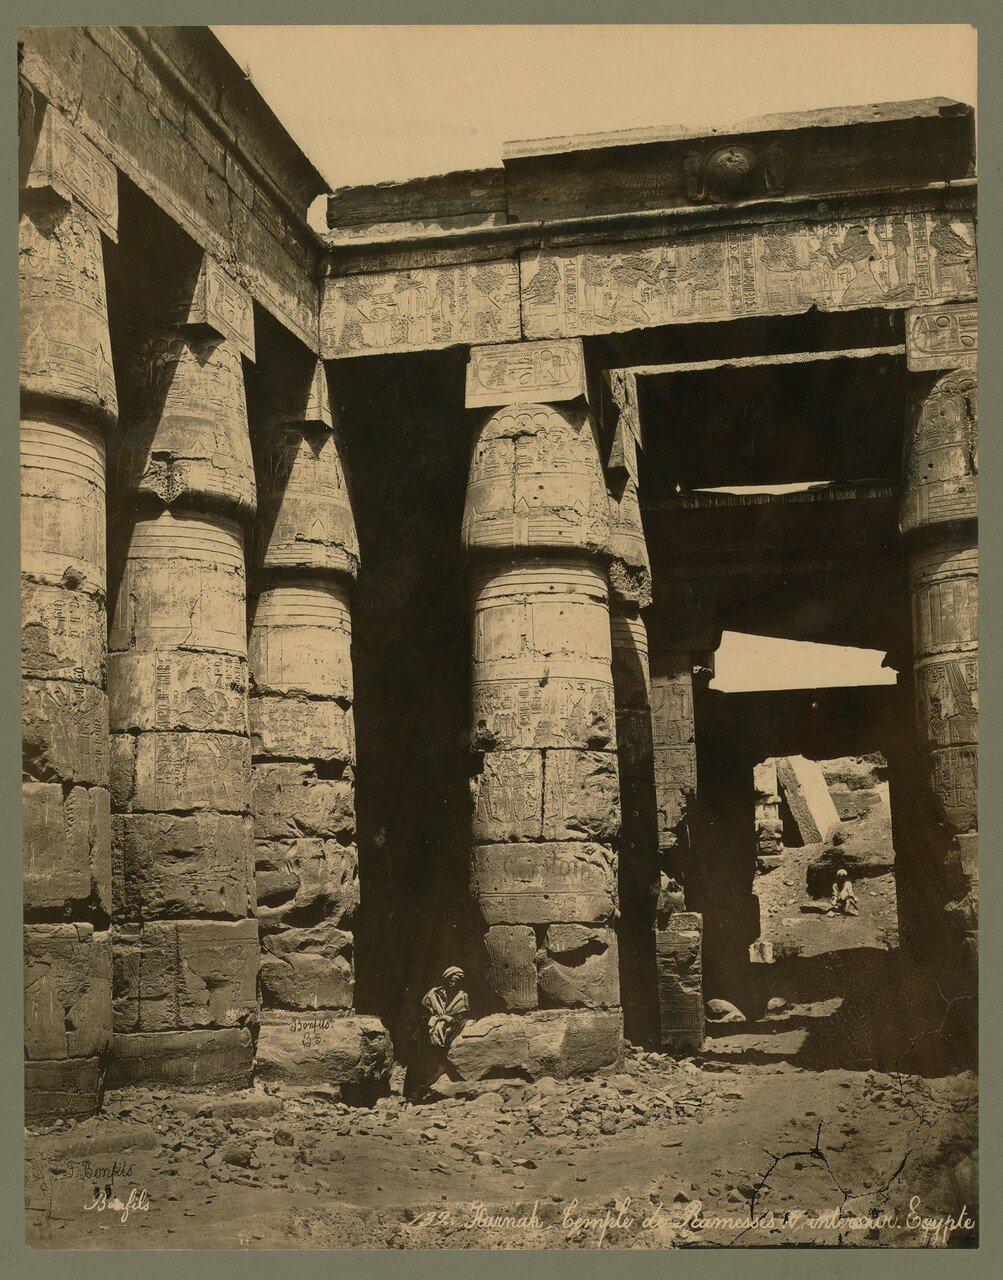 Карнак (Фивы). Интерьер храма Рамзеса IV. 1867